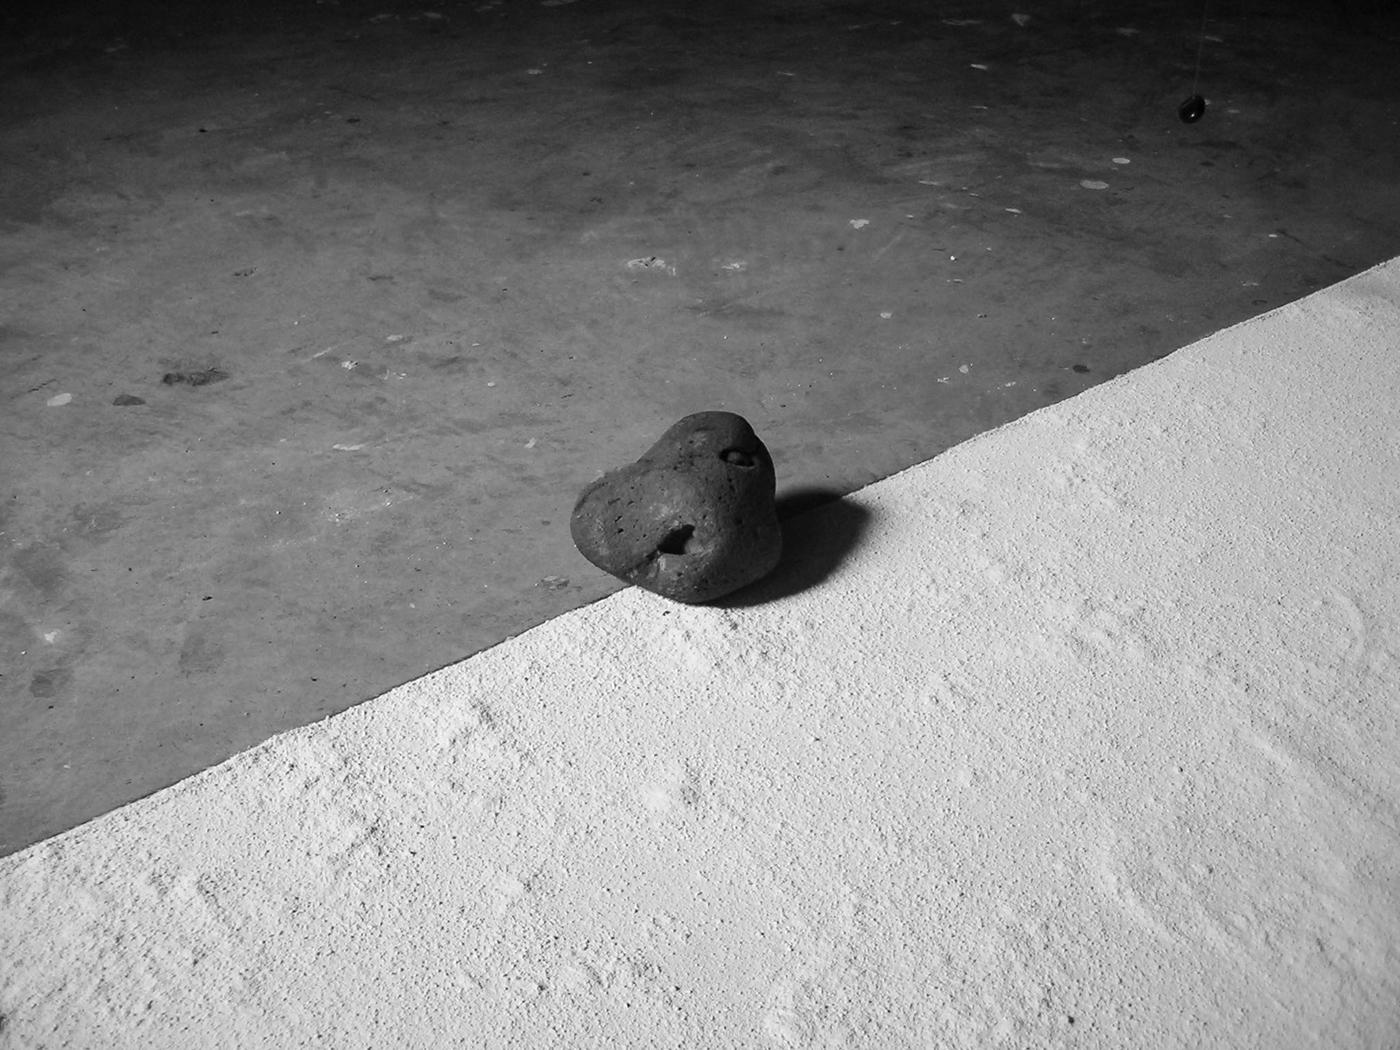 sculpture art fine art installation White Space  stone black and white minimal conceptual